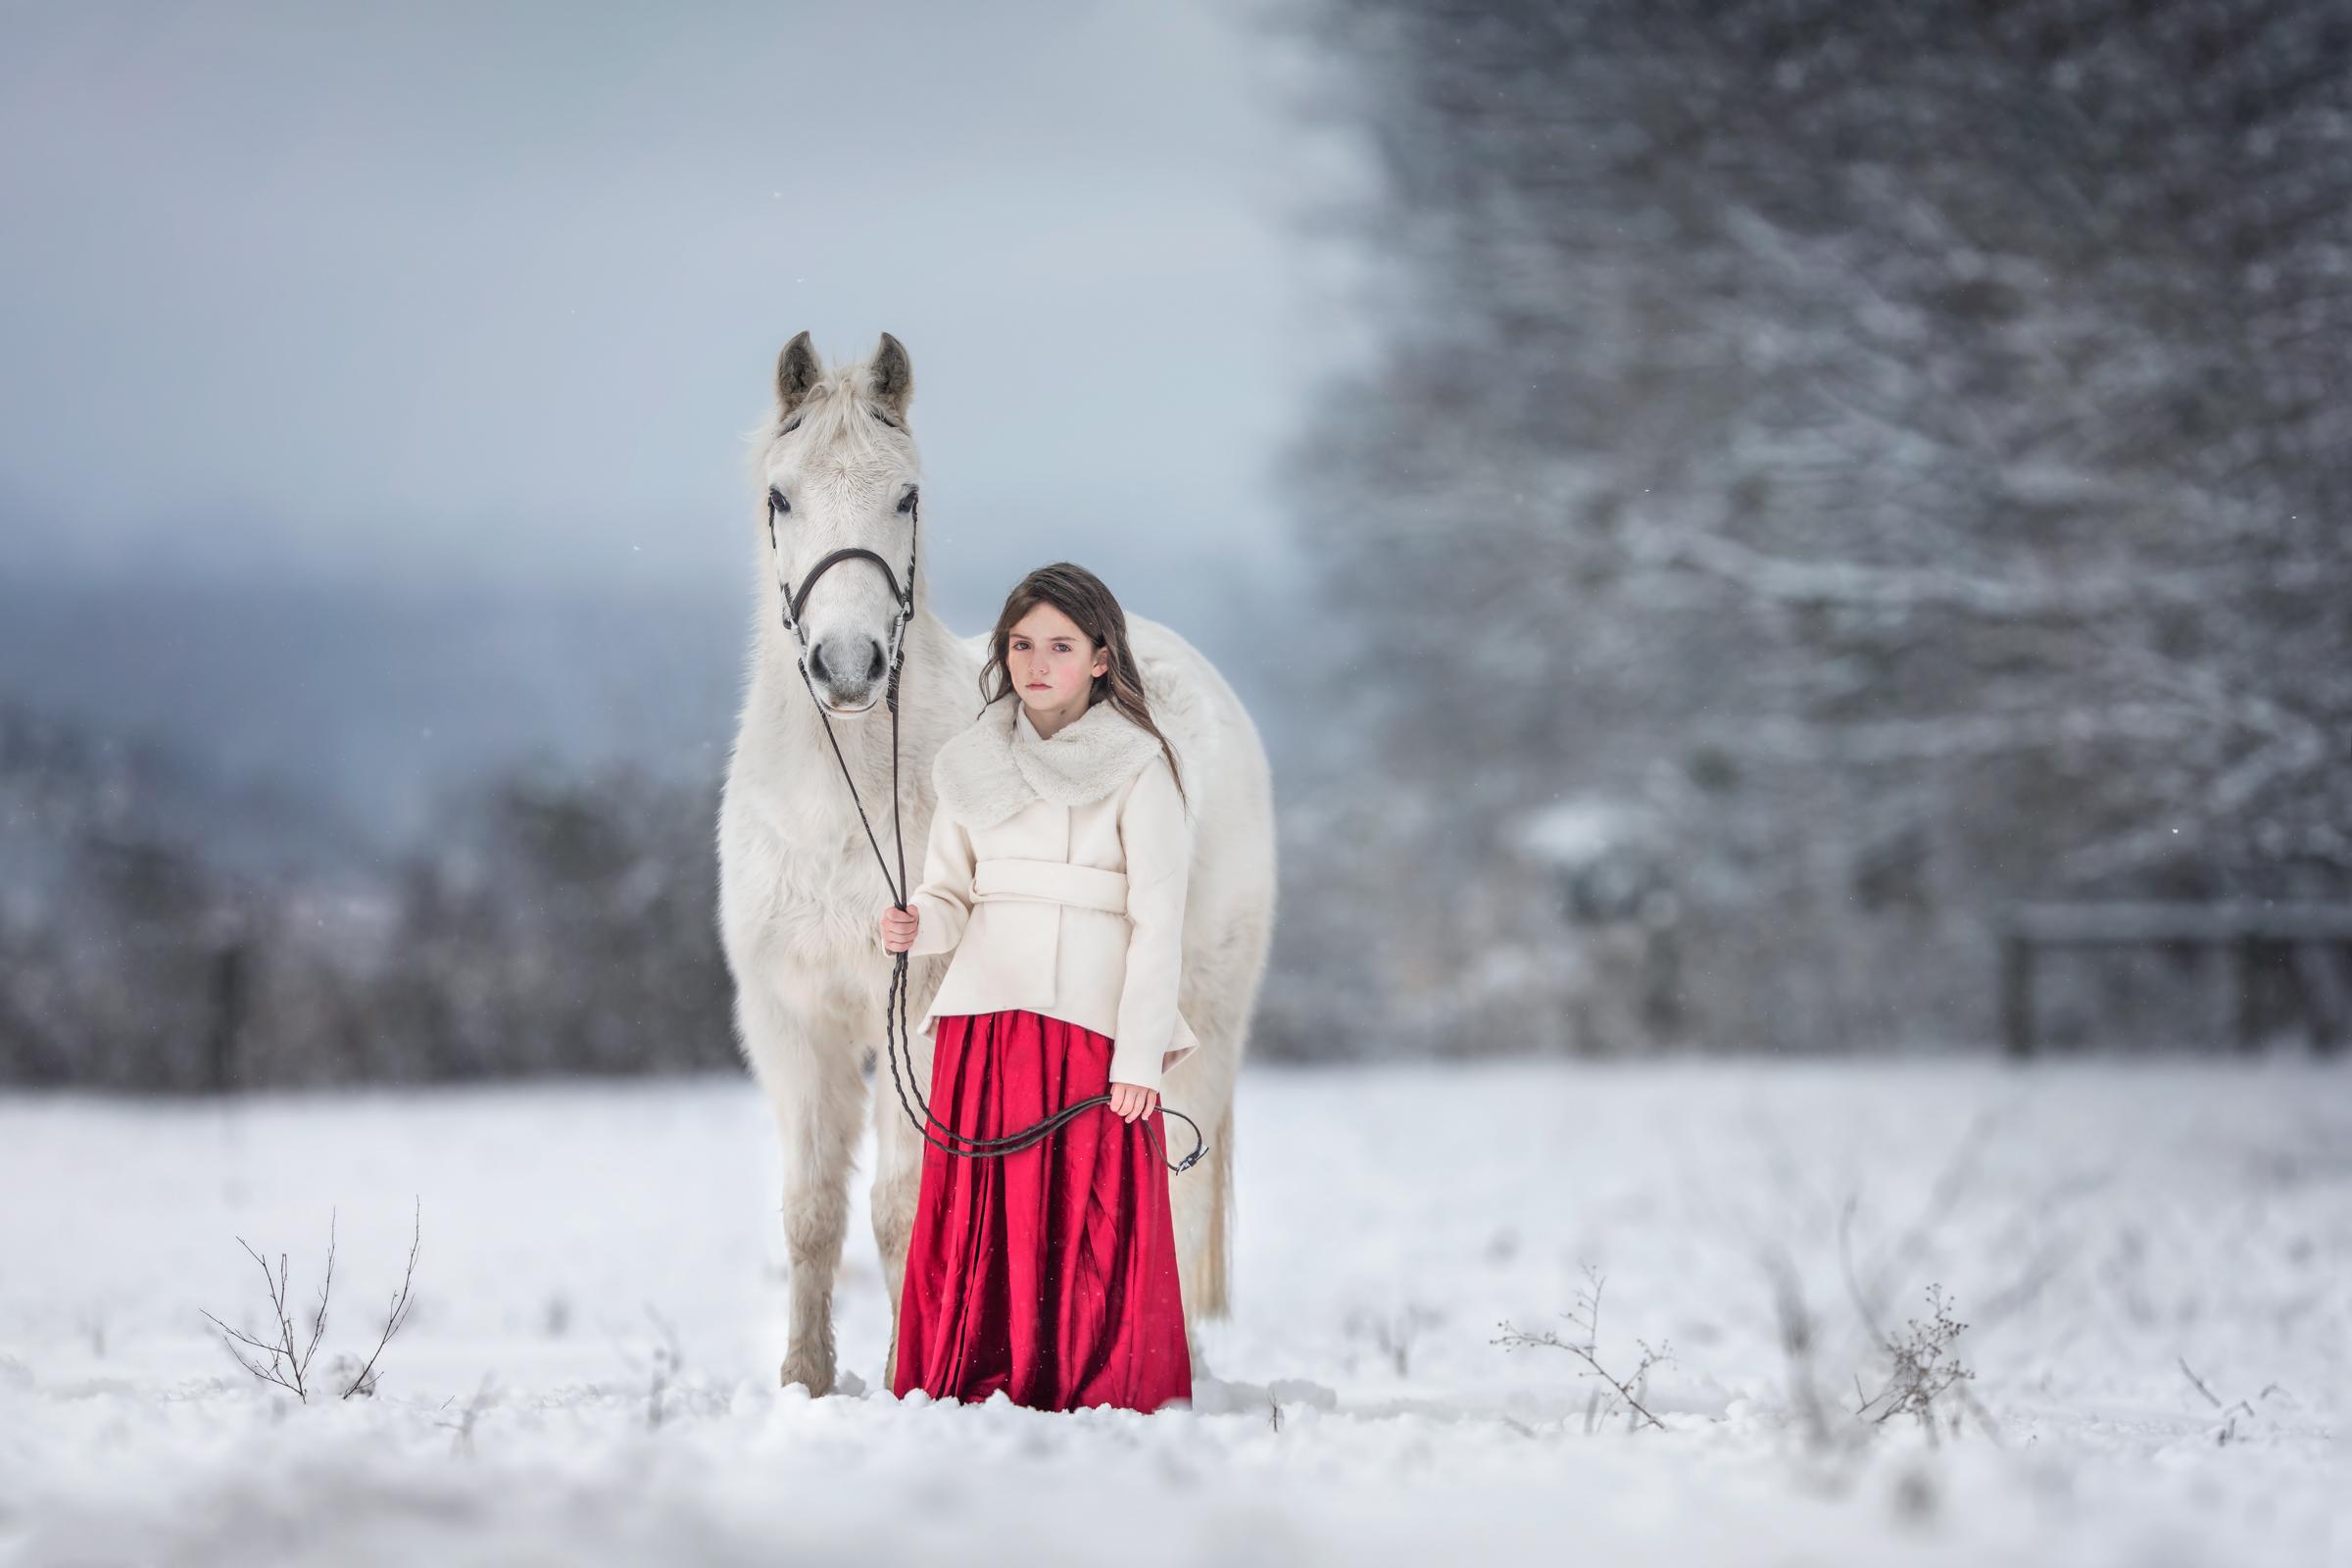 equine_photographer_middleburg_va_best_equine_photographer_poolesville_MD.jpg